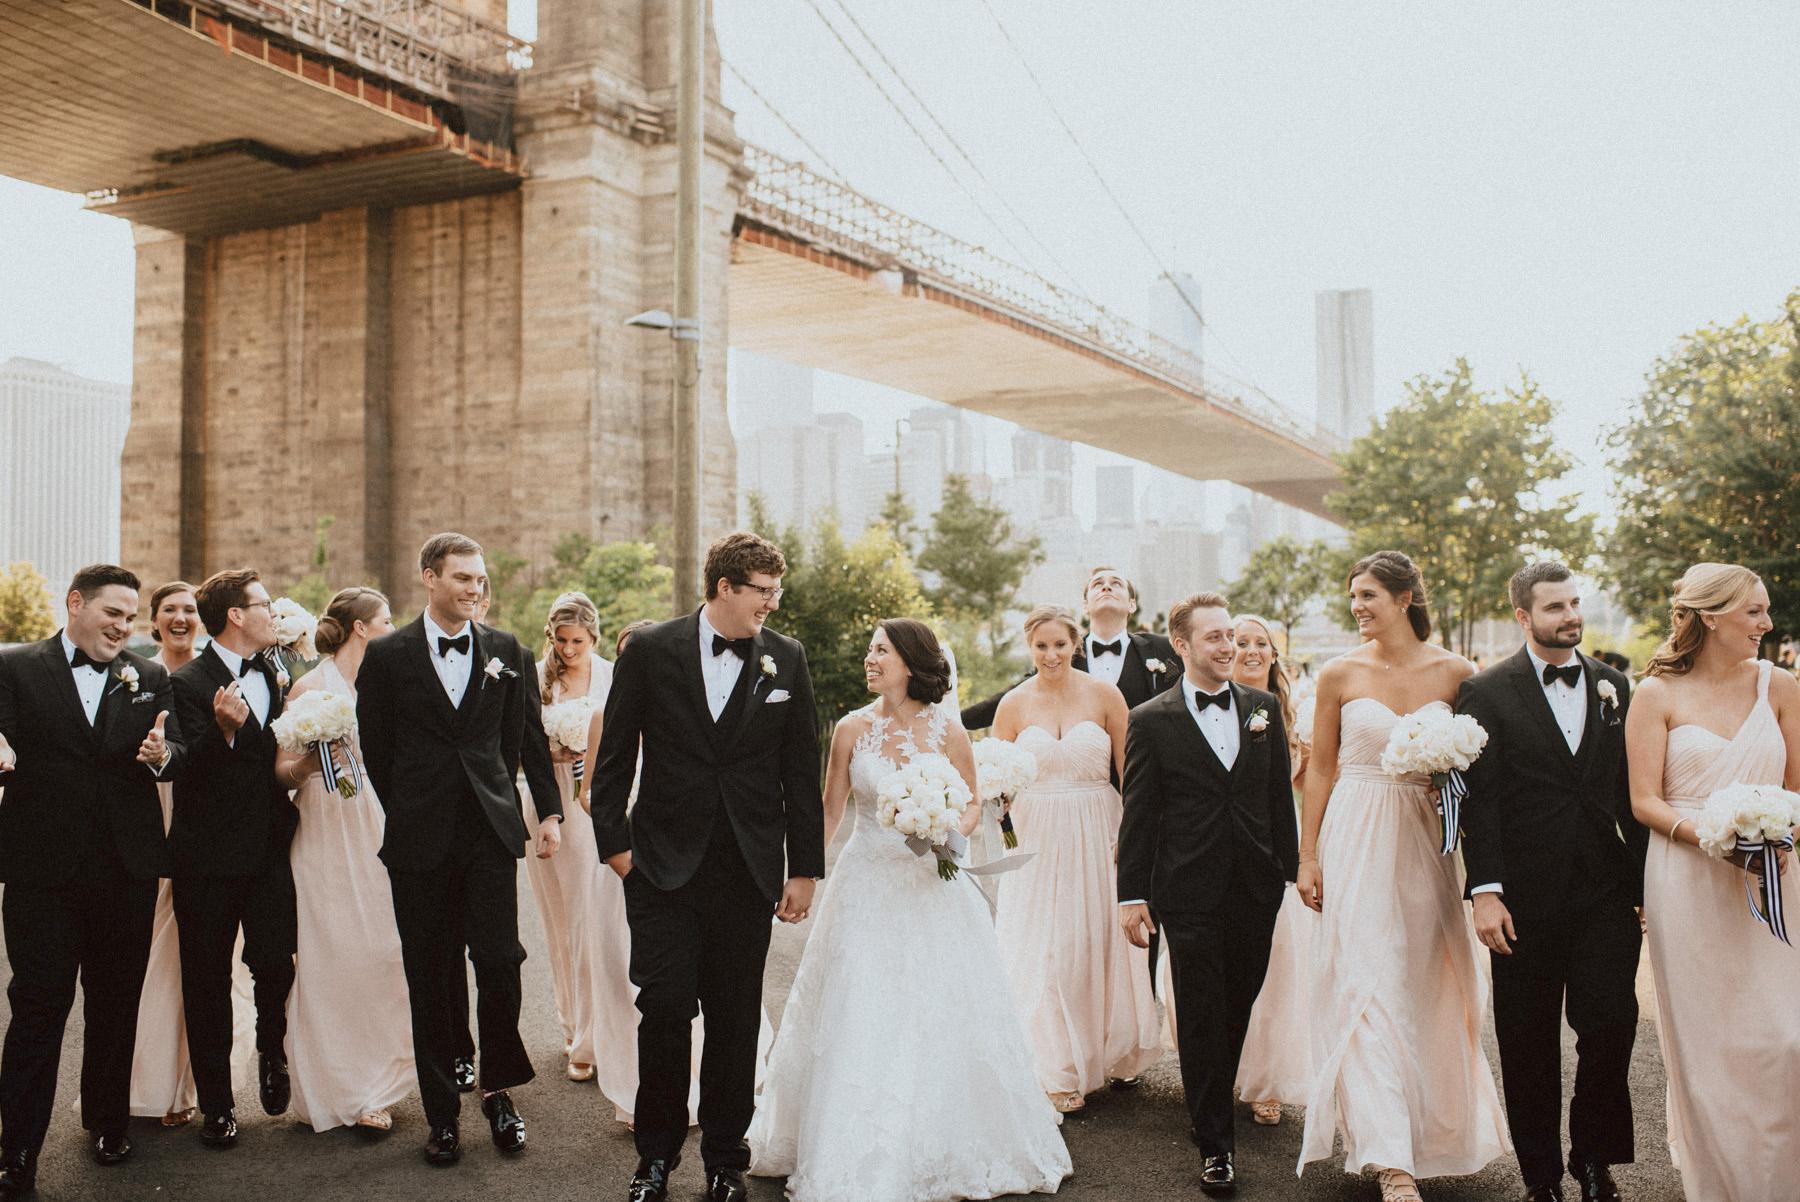 217-liberty-warehouse-brooklyn-wedding-5.jpg